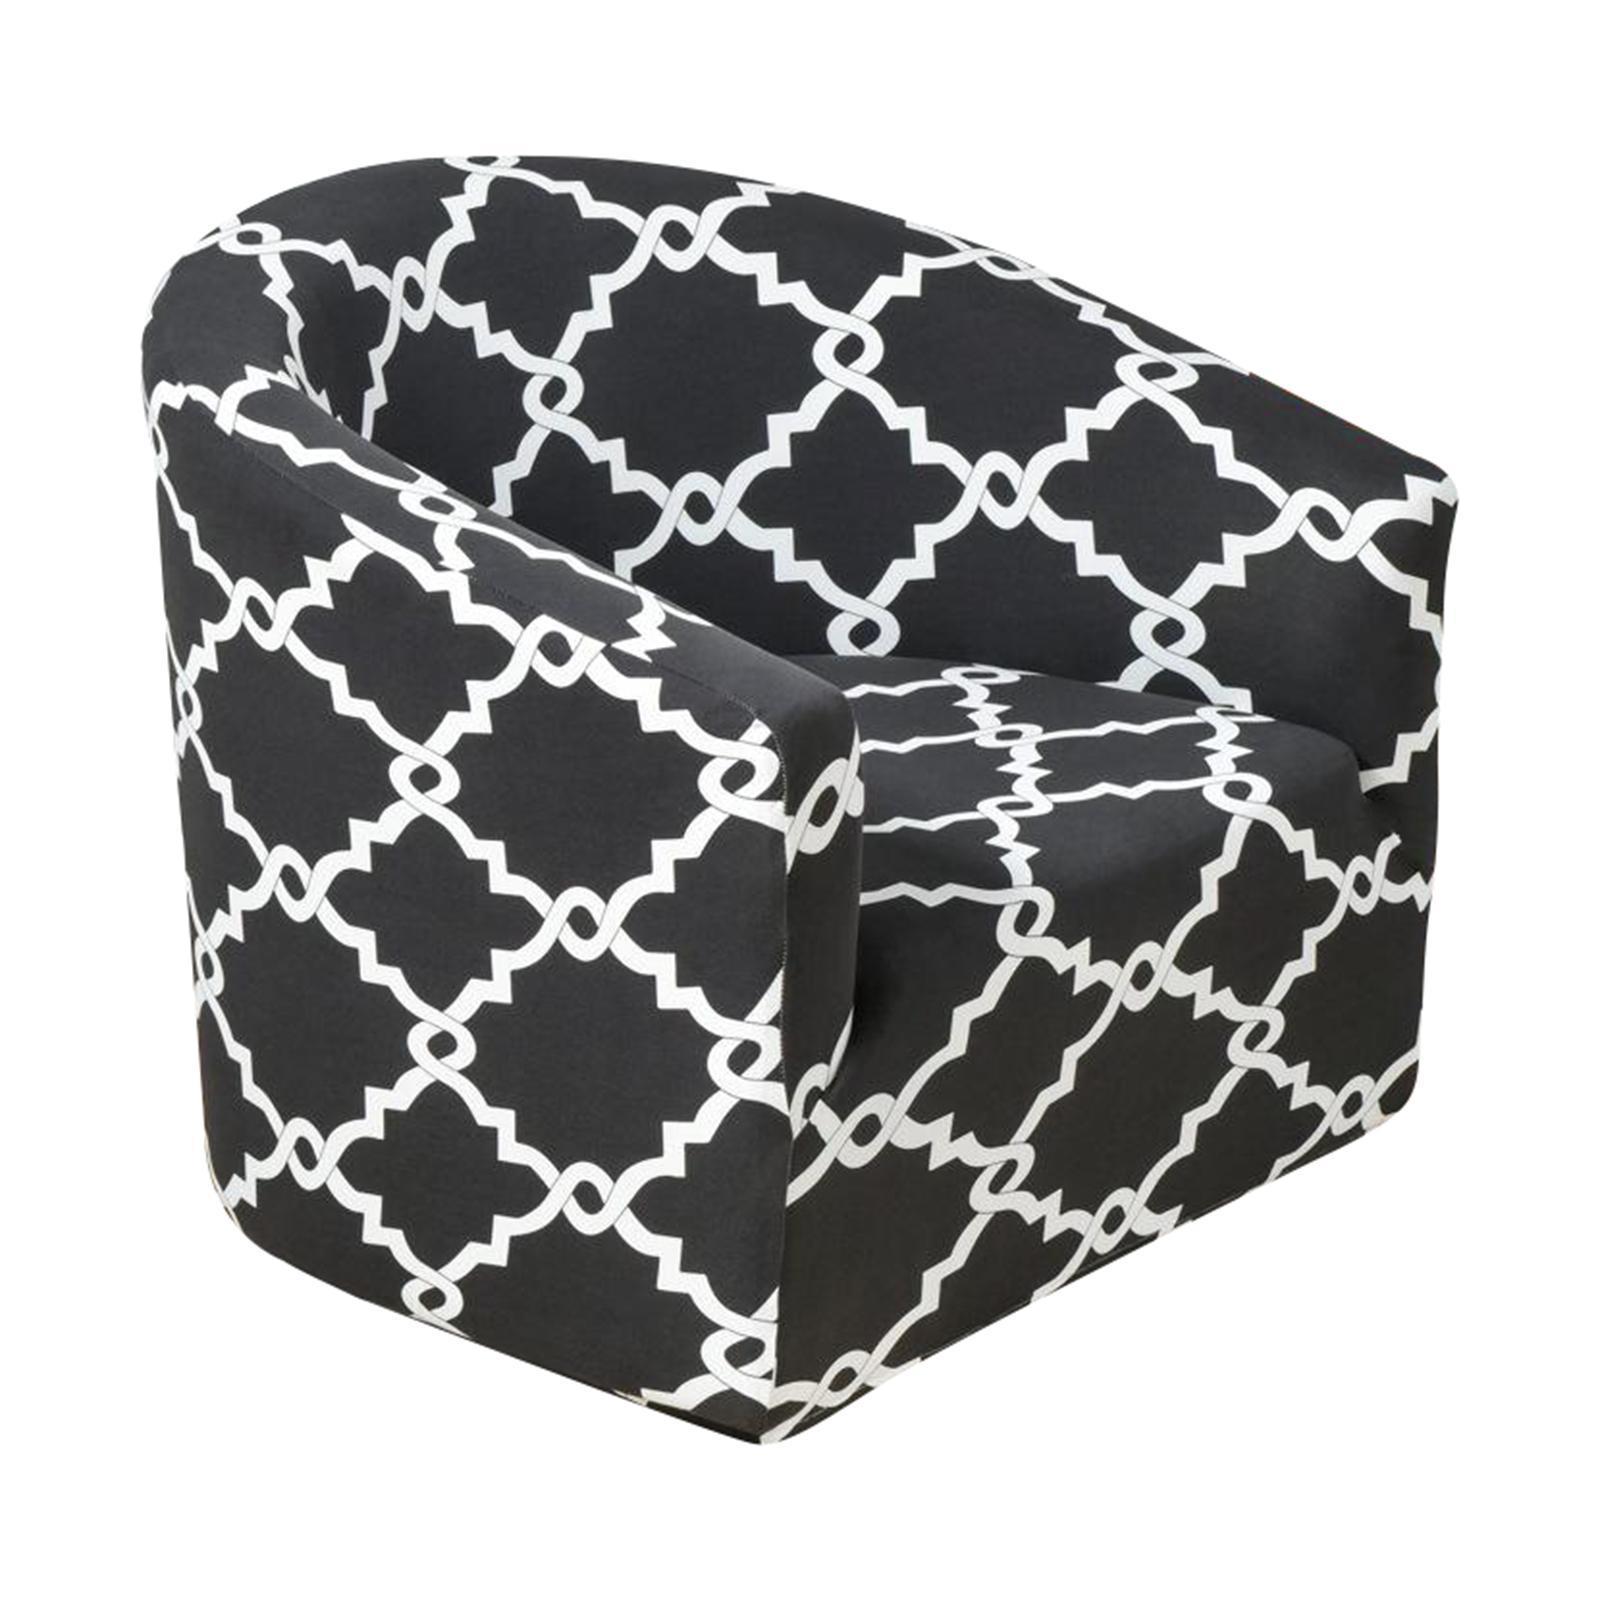 miniatura 16 - Fodera per poltrona singola per poltrona Fodera per sedia in colori assortiti